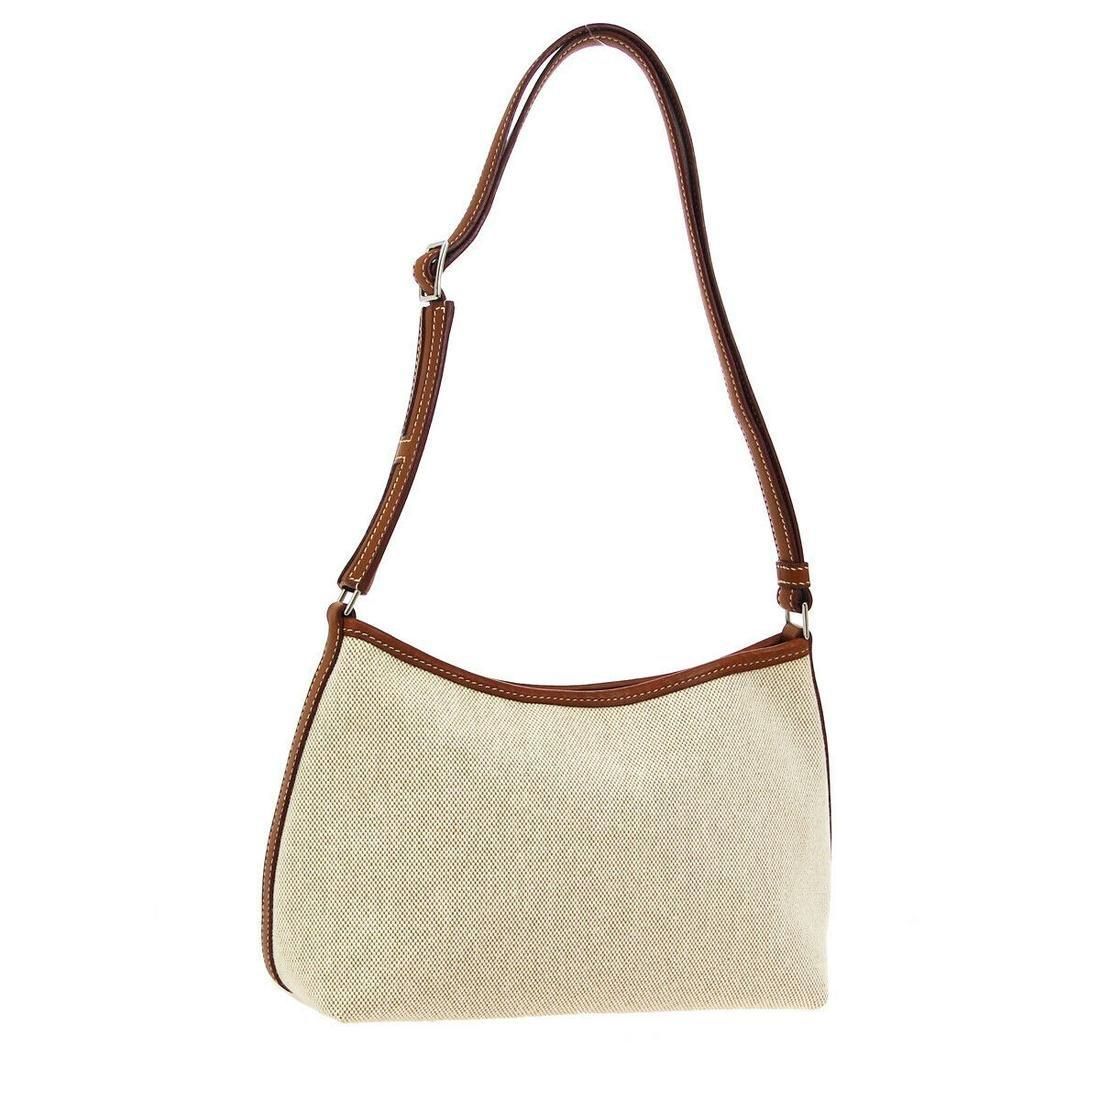 Authentic HERMES BERLINGO PM Cross Body Shoulder Bag